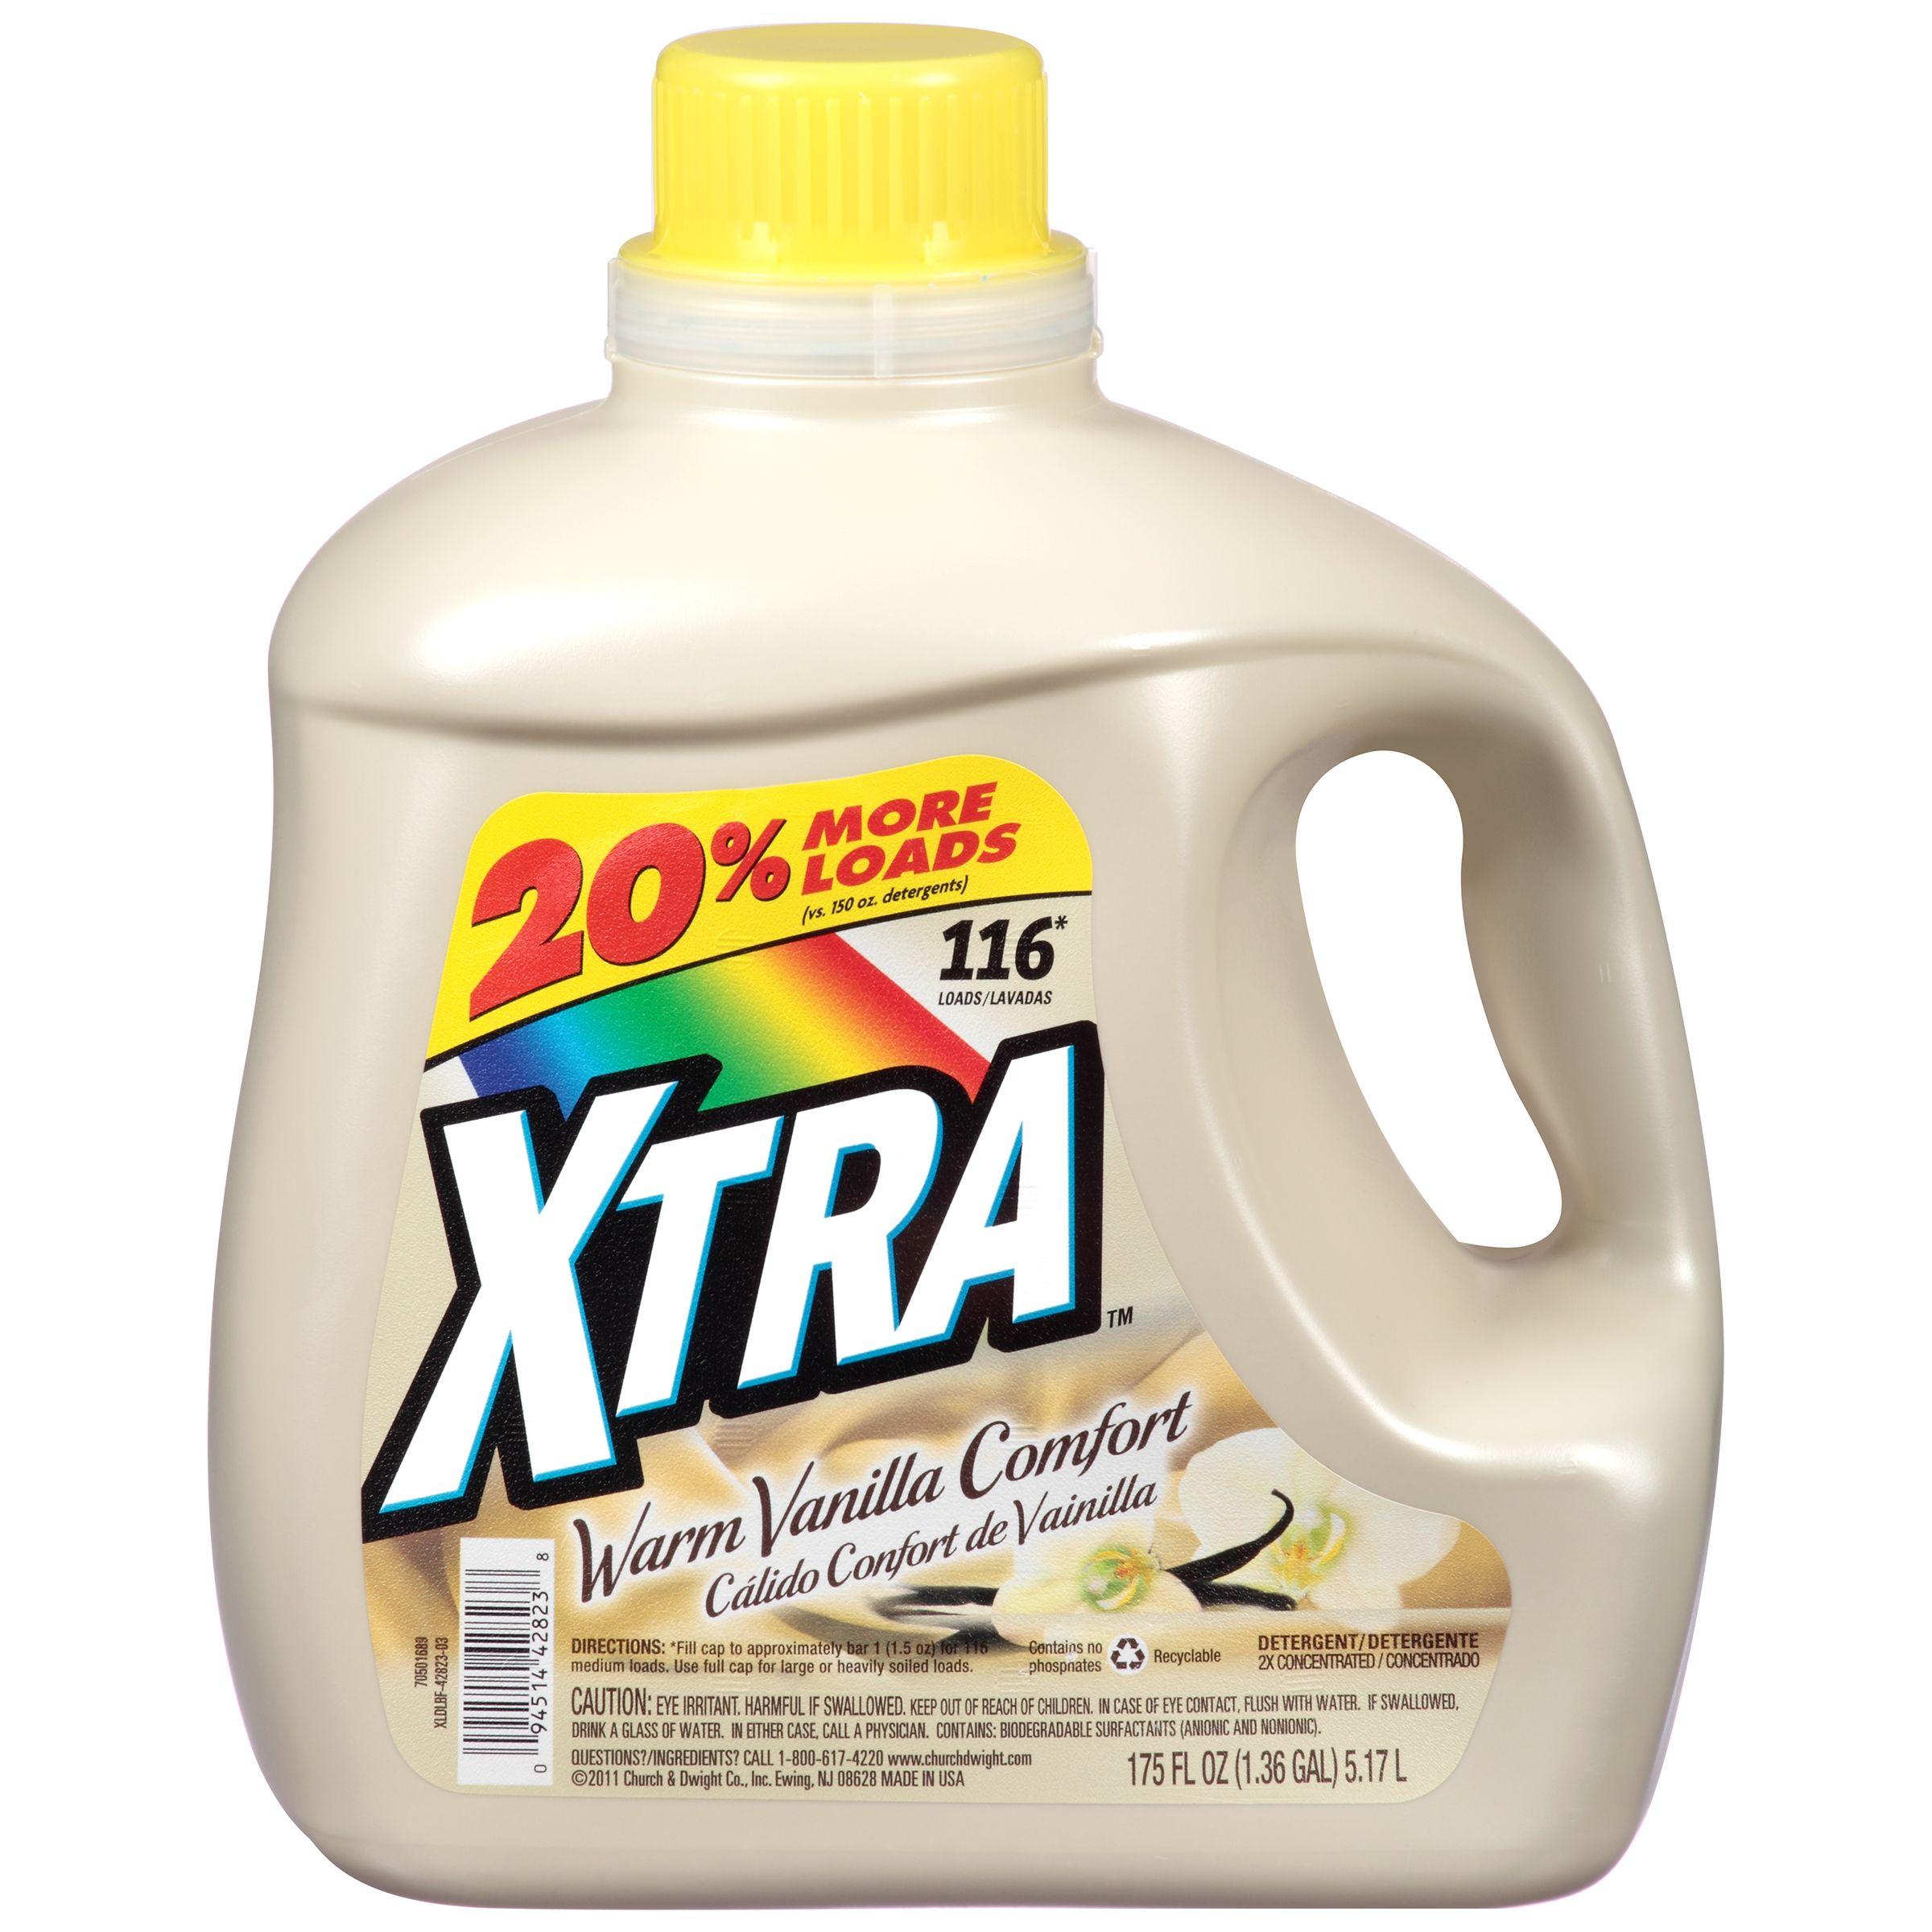 Xtra Fabric Conditoner Laundry Detergent Laundry Soap Dollar